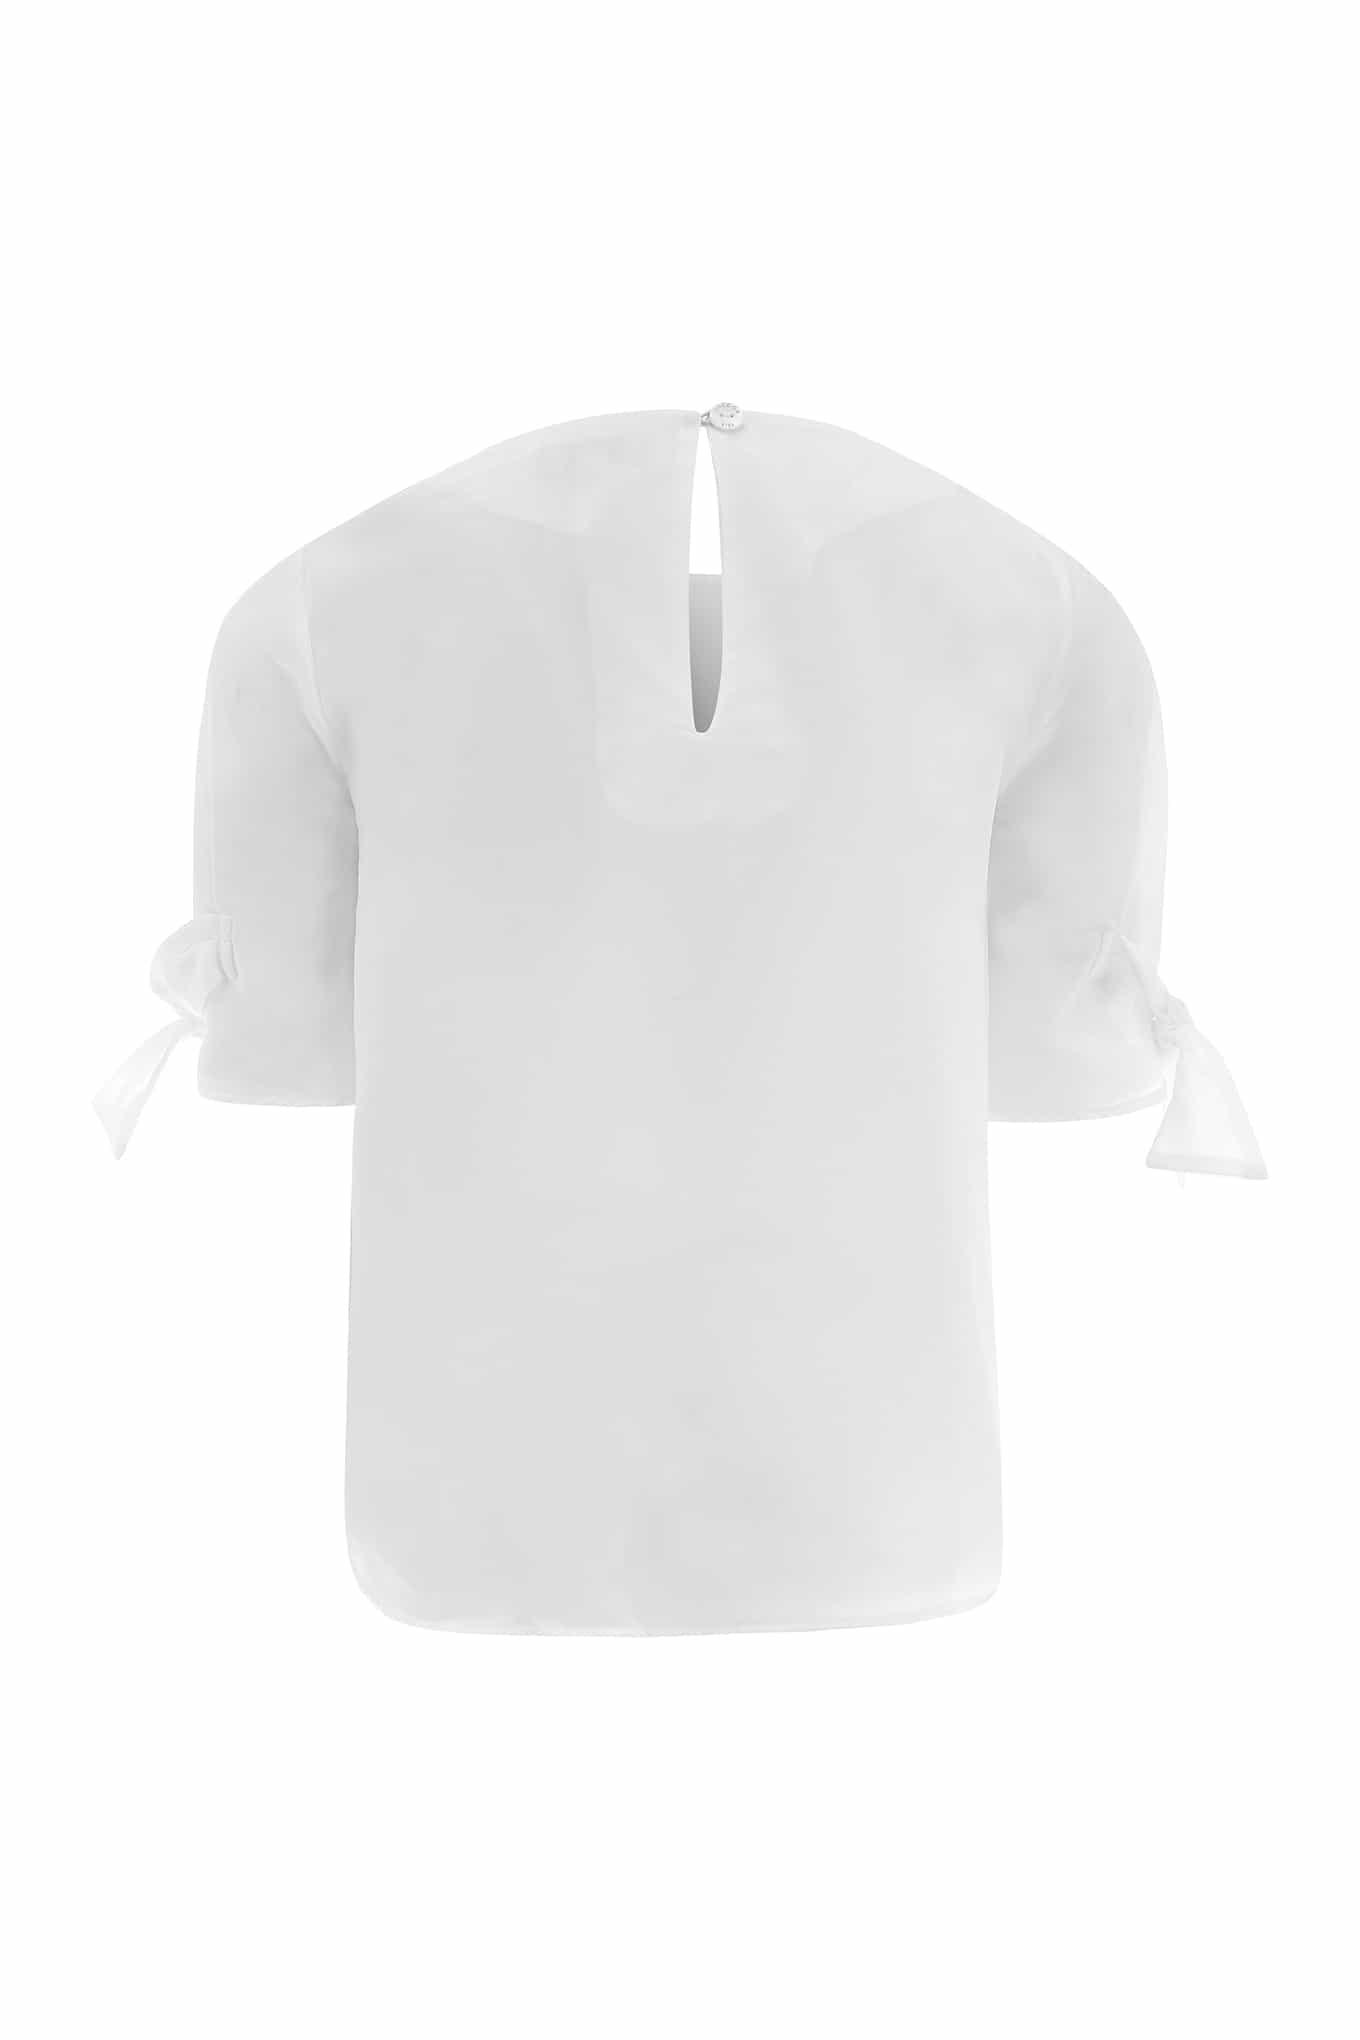 Blusa Branco Casual Rapariga